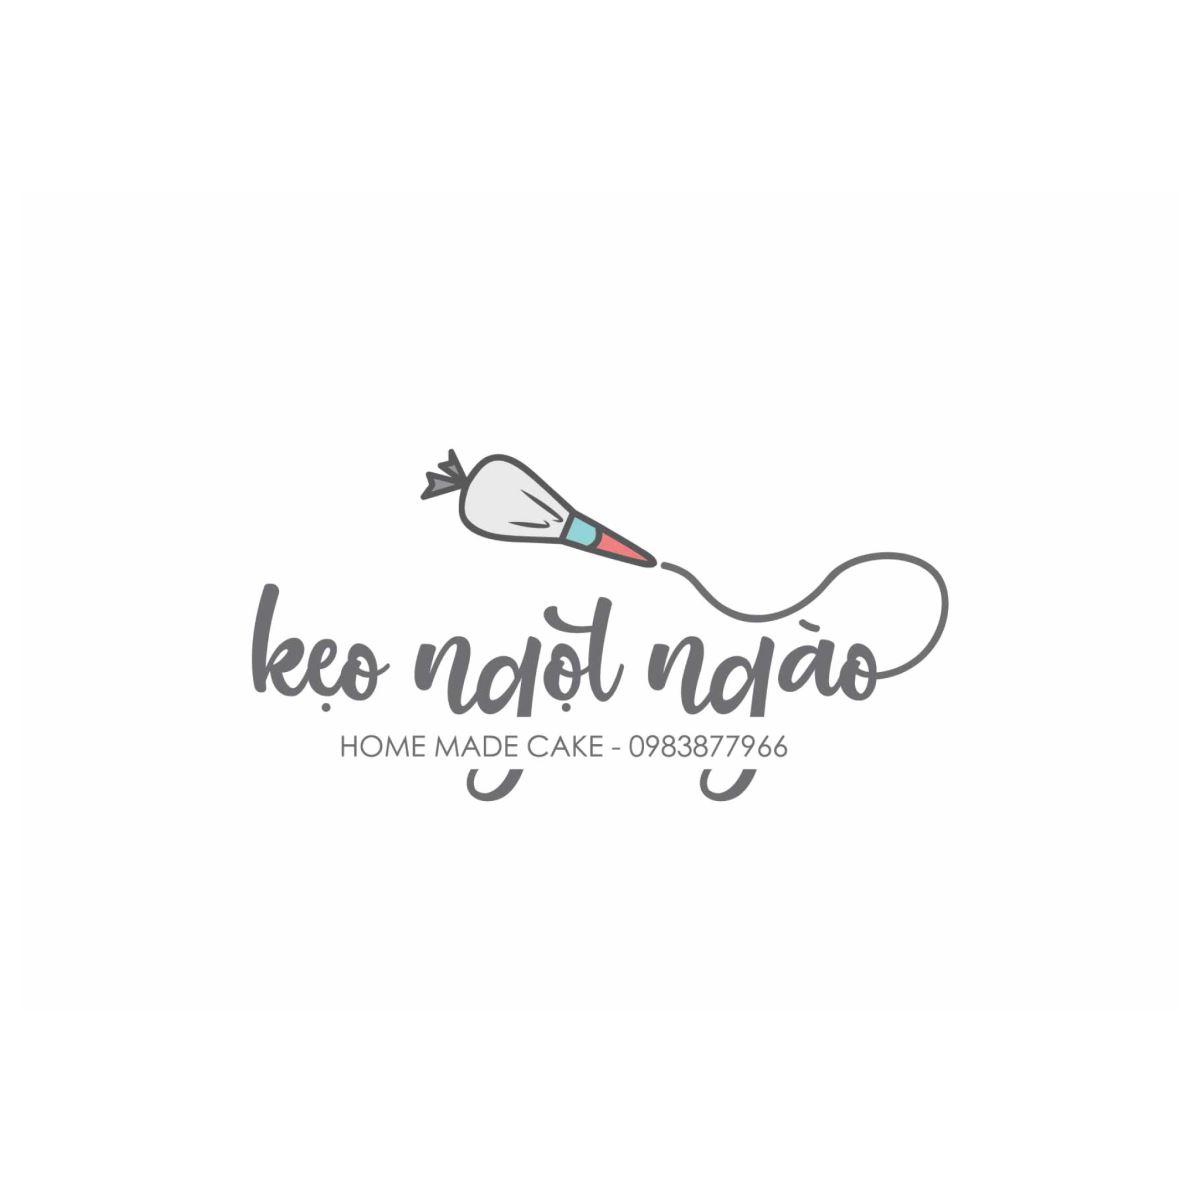 logo-nganh-thuc-pham-bee-art-09